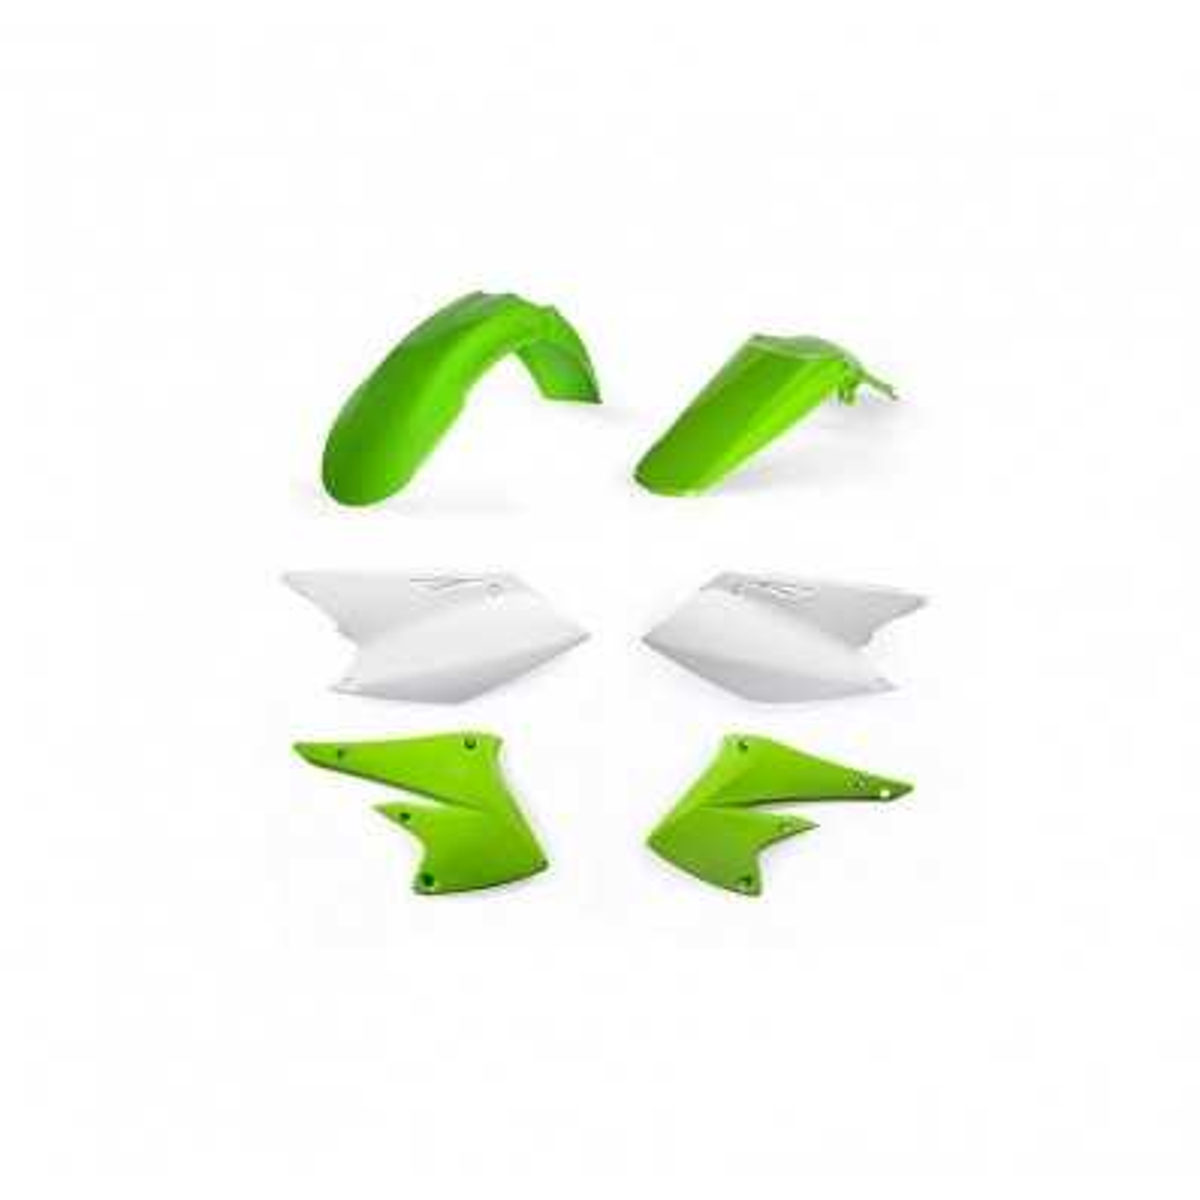 0022984-130 - Kit Plasticos Kxf 250 18 Verde